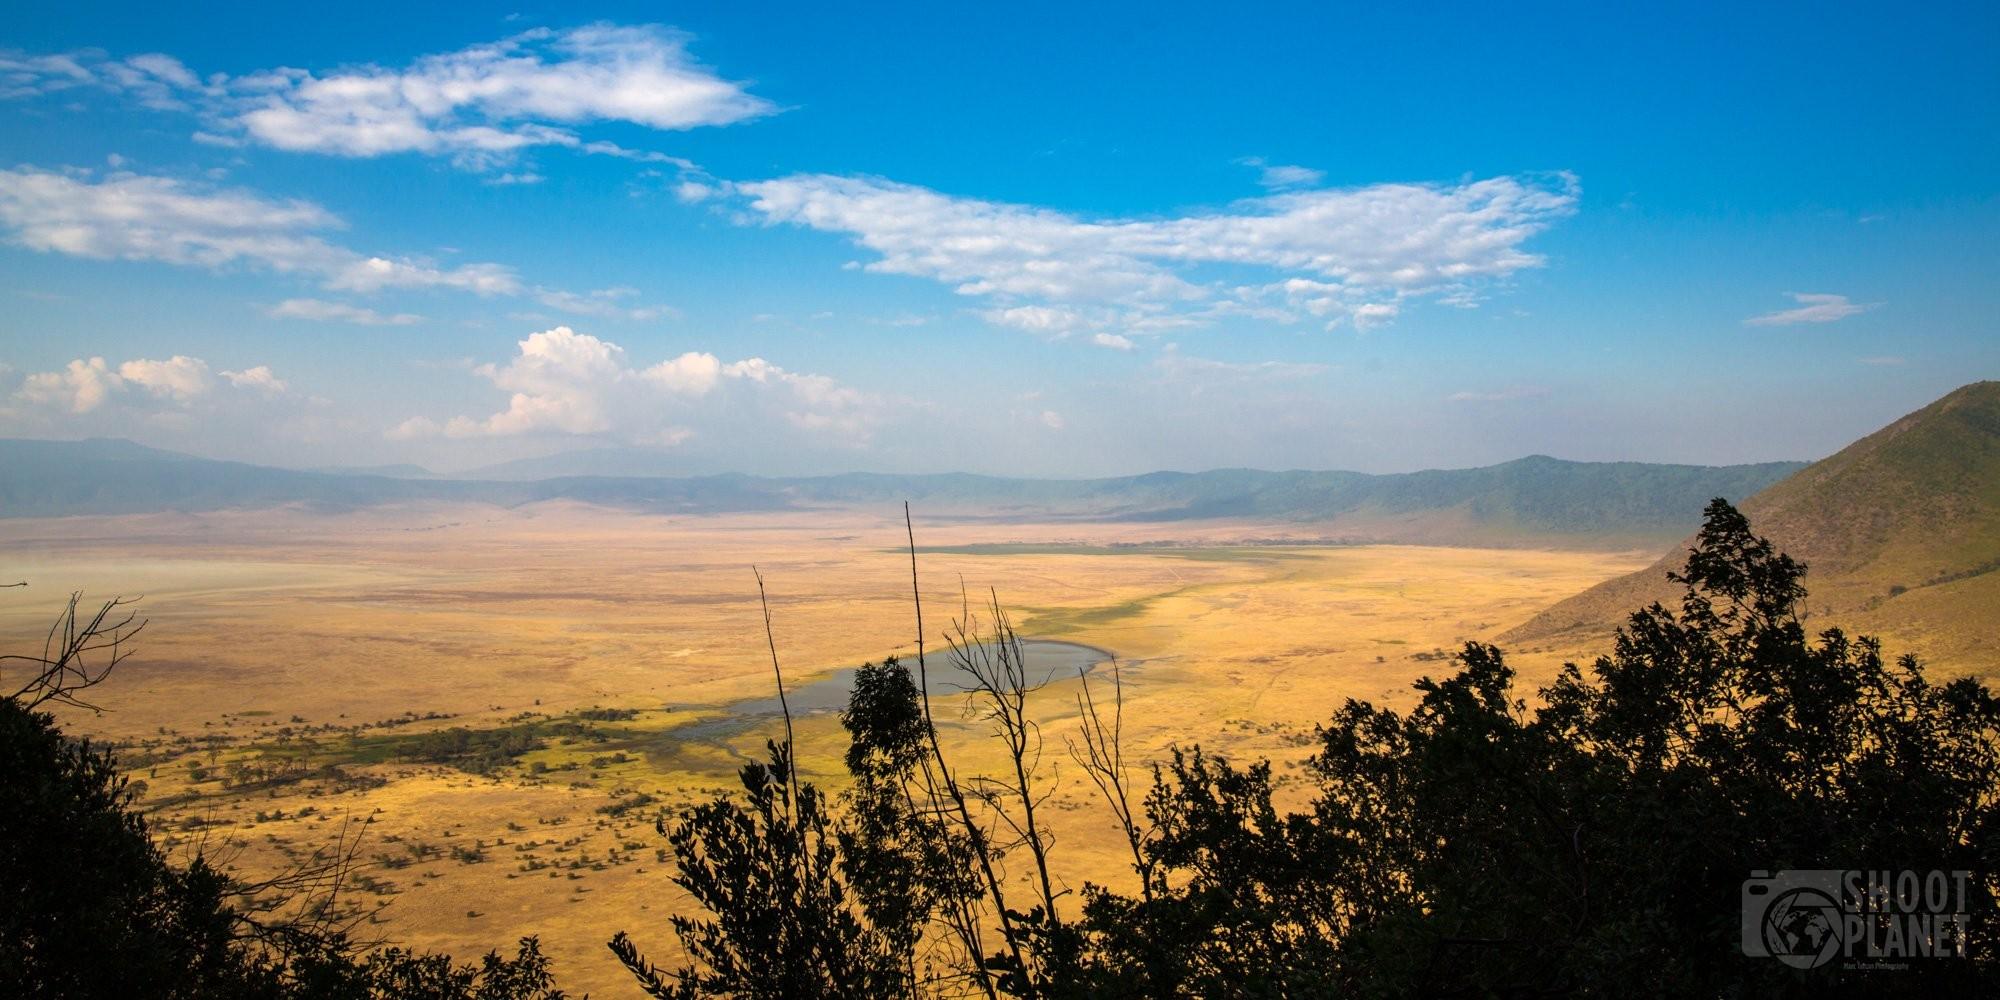 Ngorongoro Crater and lake, Tanzania Africa